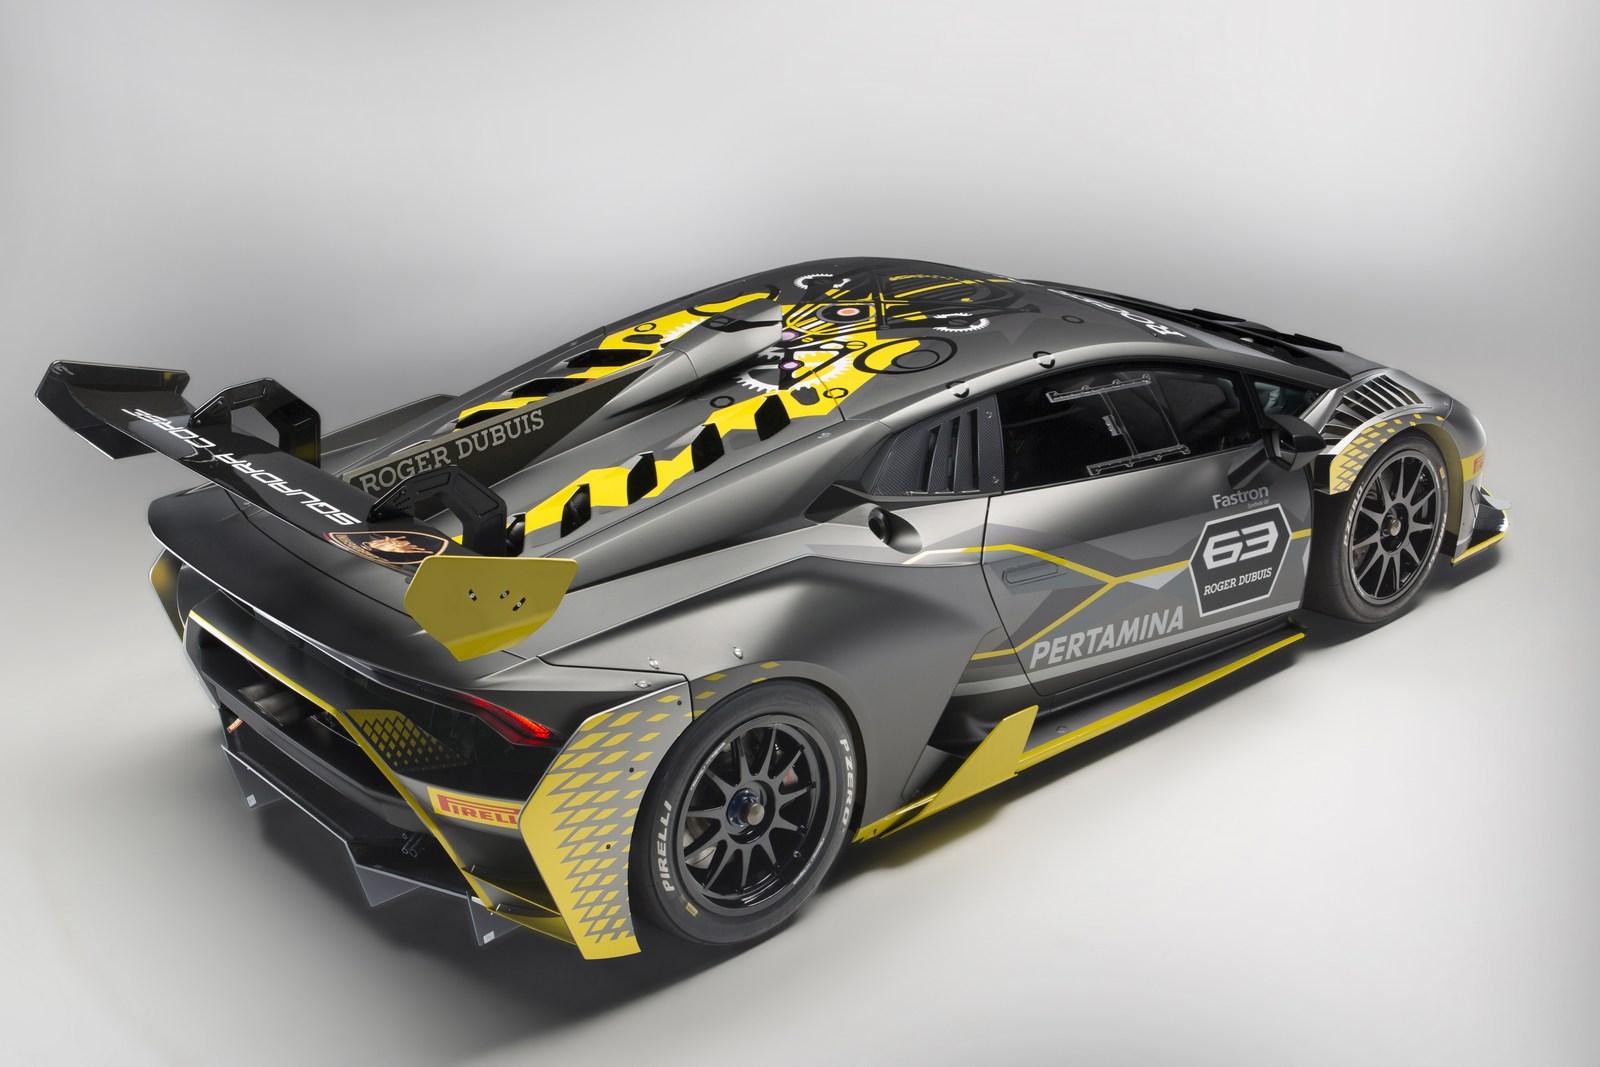 lamborghini huracan super trofeo evo unveiled with improved aerodynamics carscoops. Black Bedroom Furniture Sets. Home Design Ideas